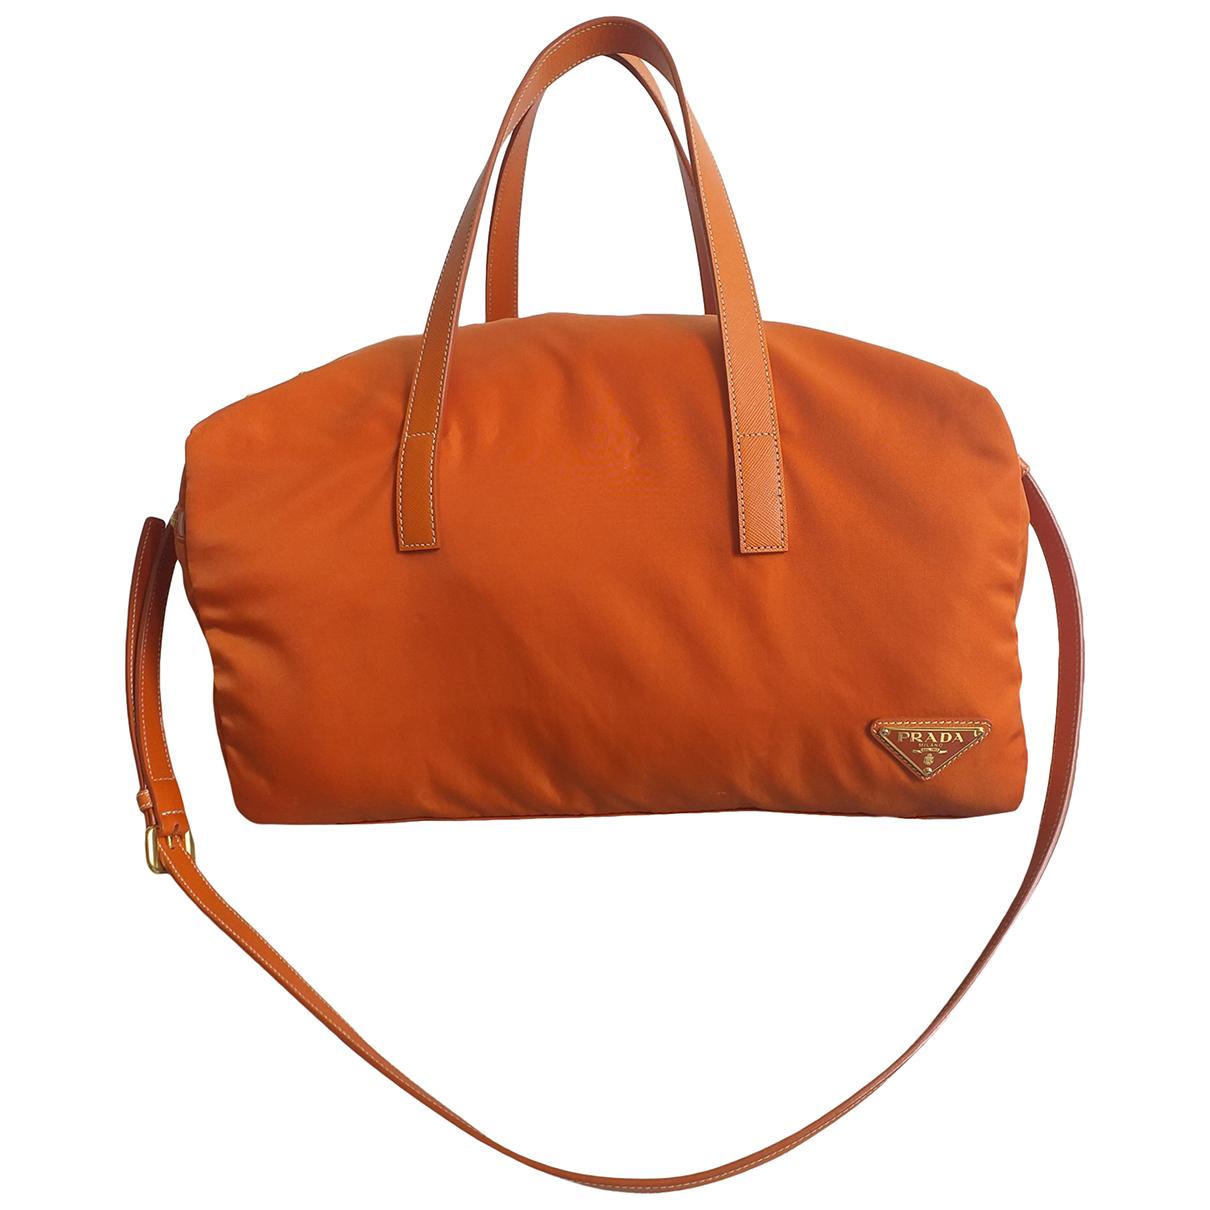 Prada - Sac a main   pour femme en toile - orange